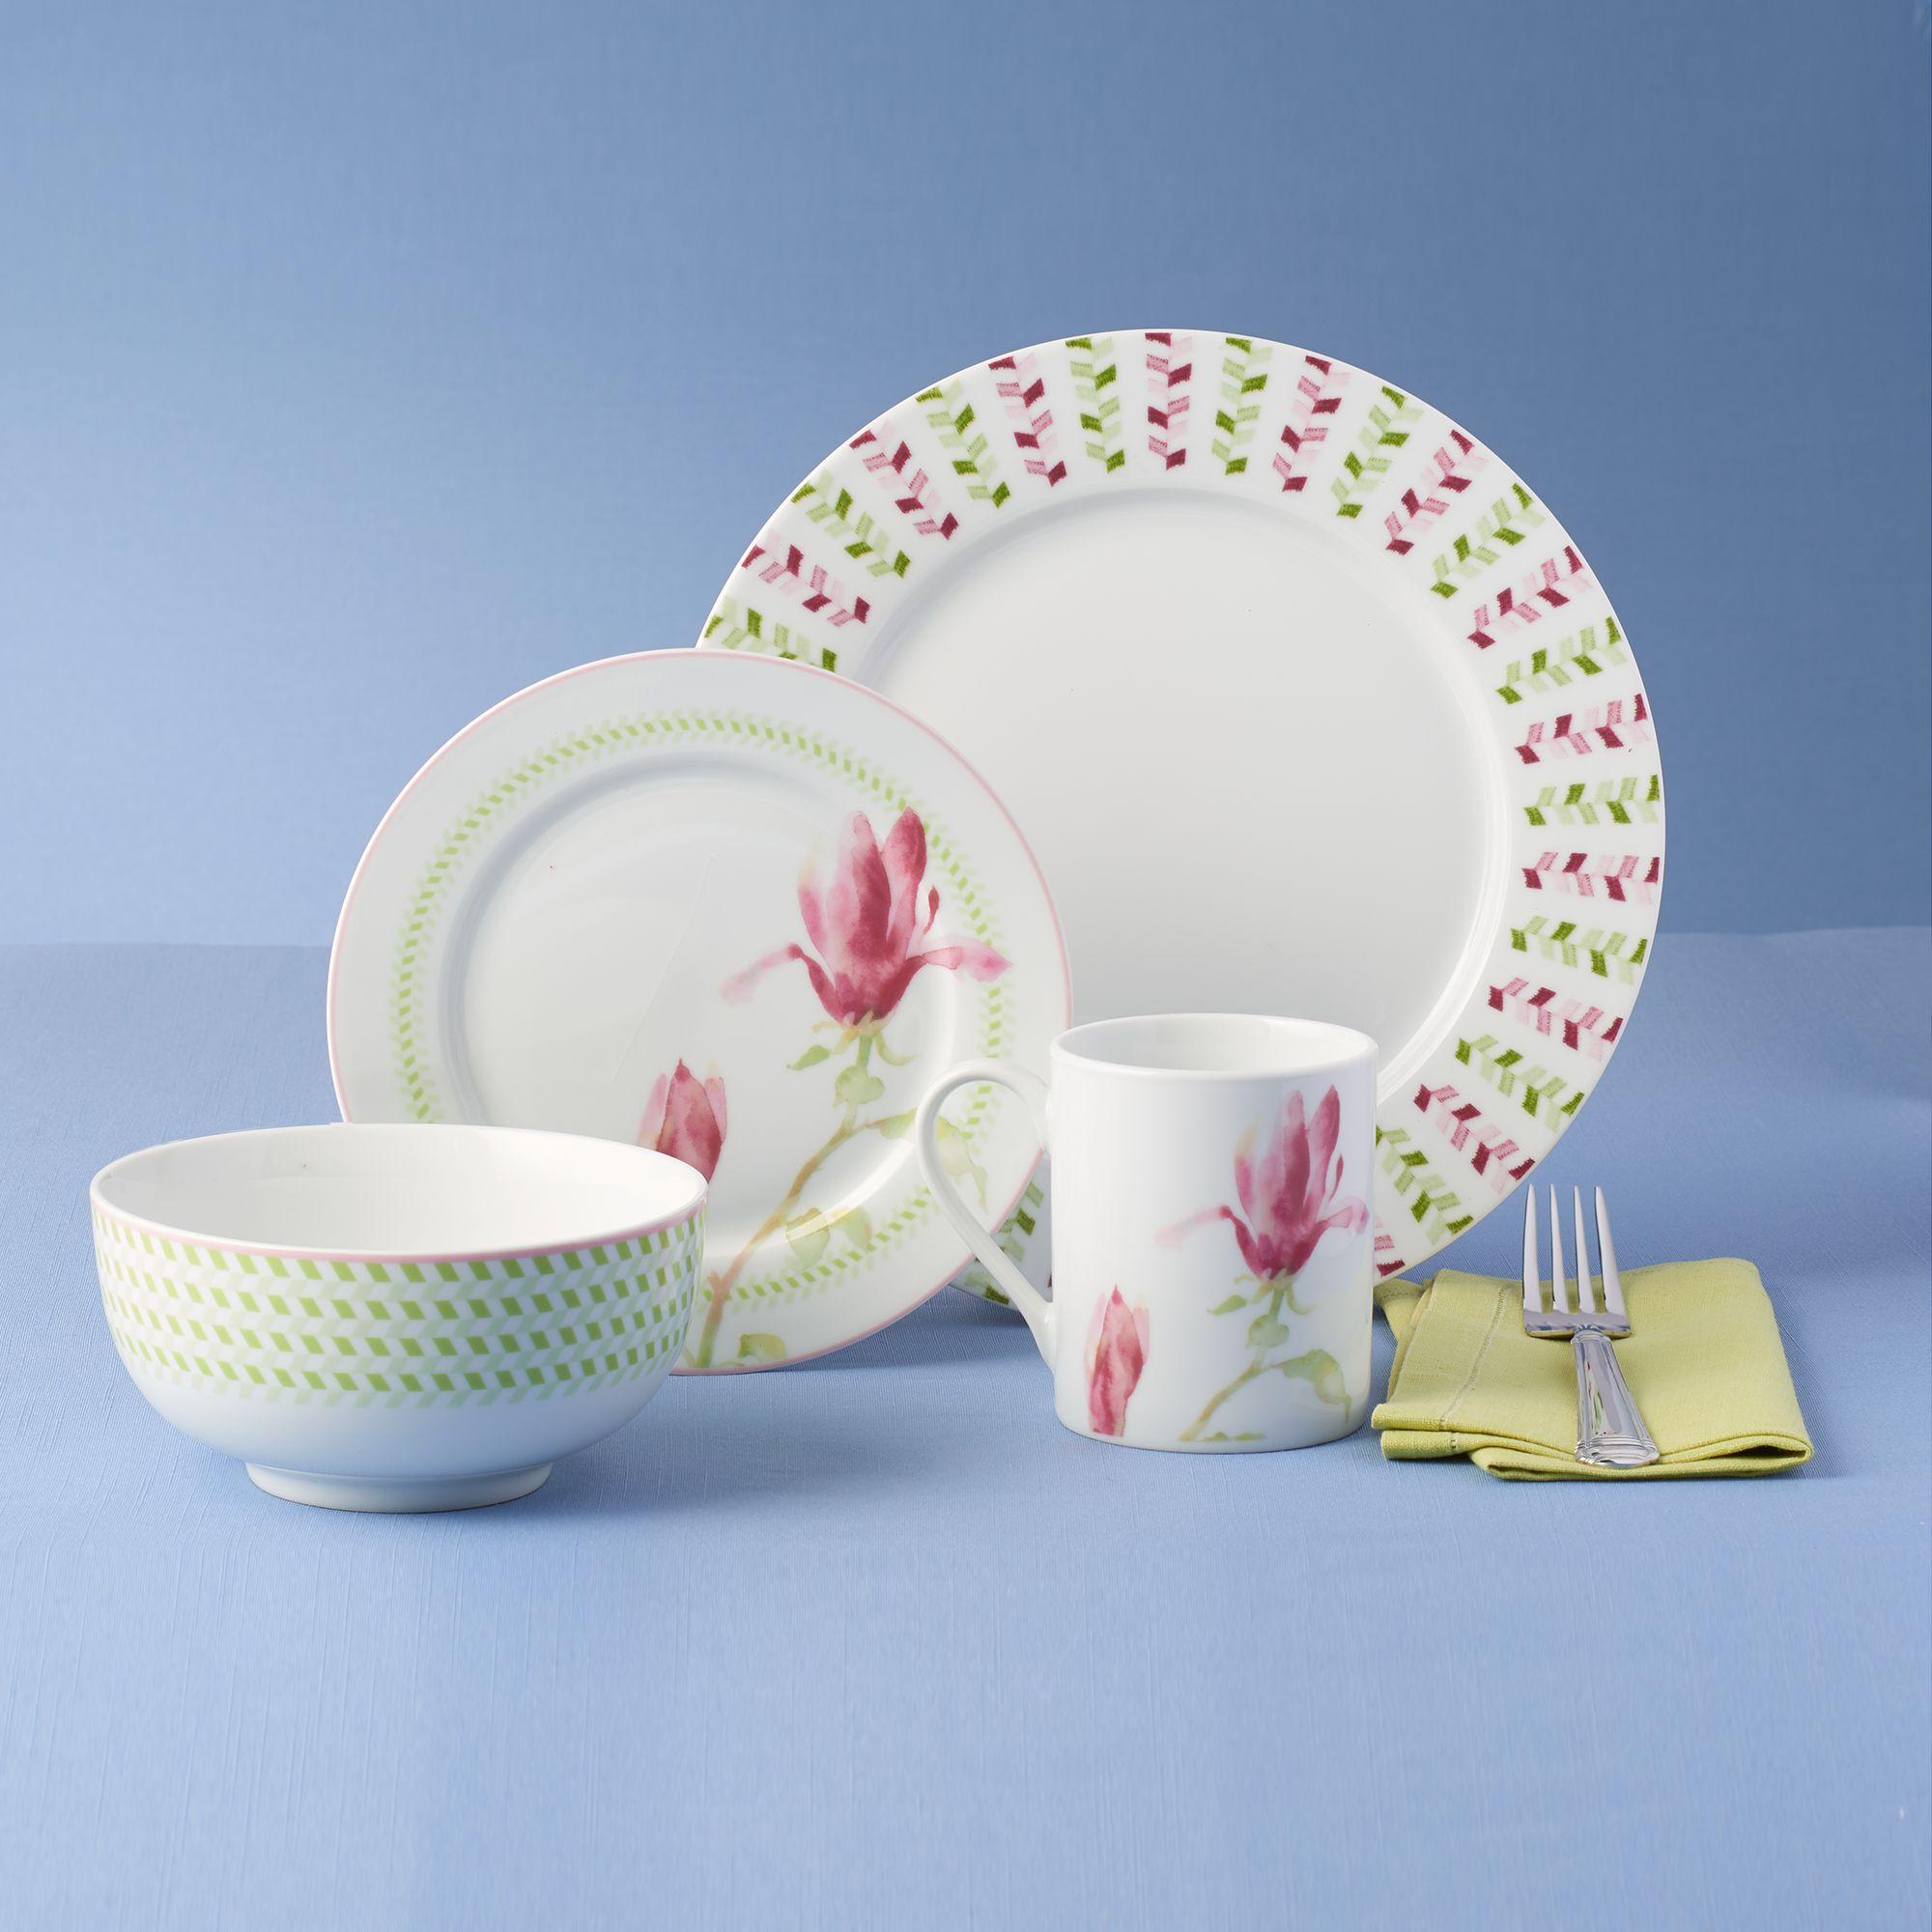 Spode \u0026quot;Magnolia Haze\u0026quot; Porcelain Dinnerware  default & Spode \